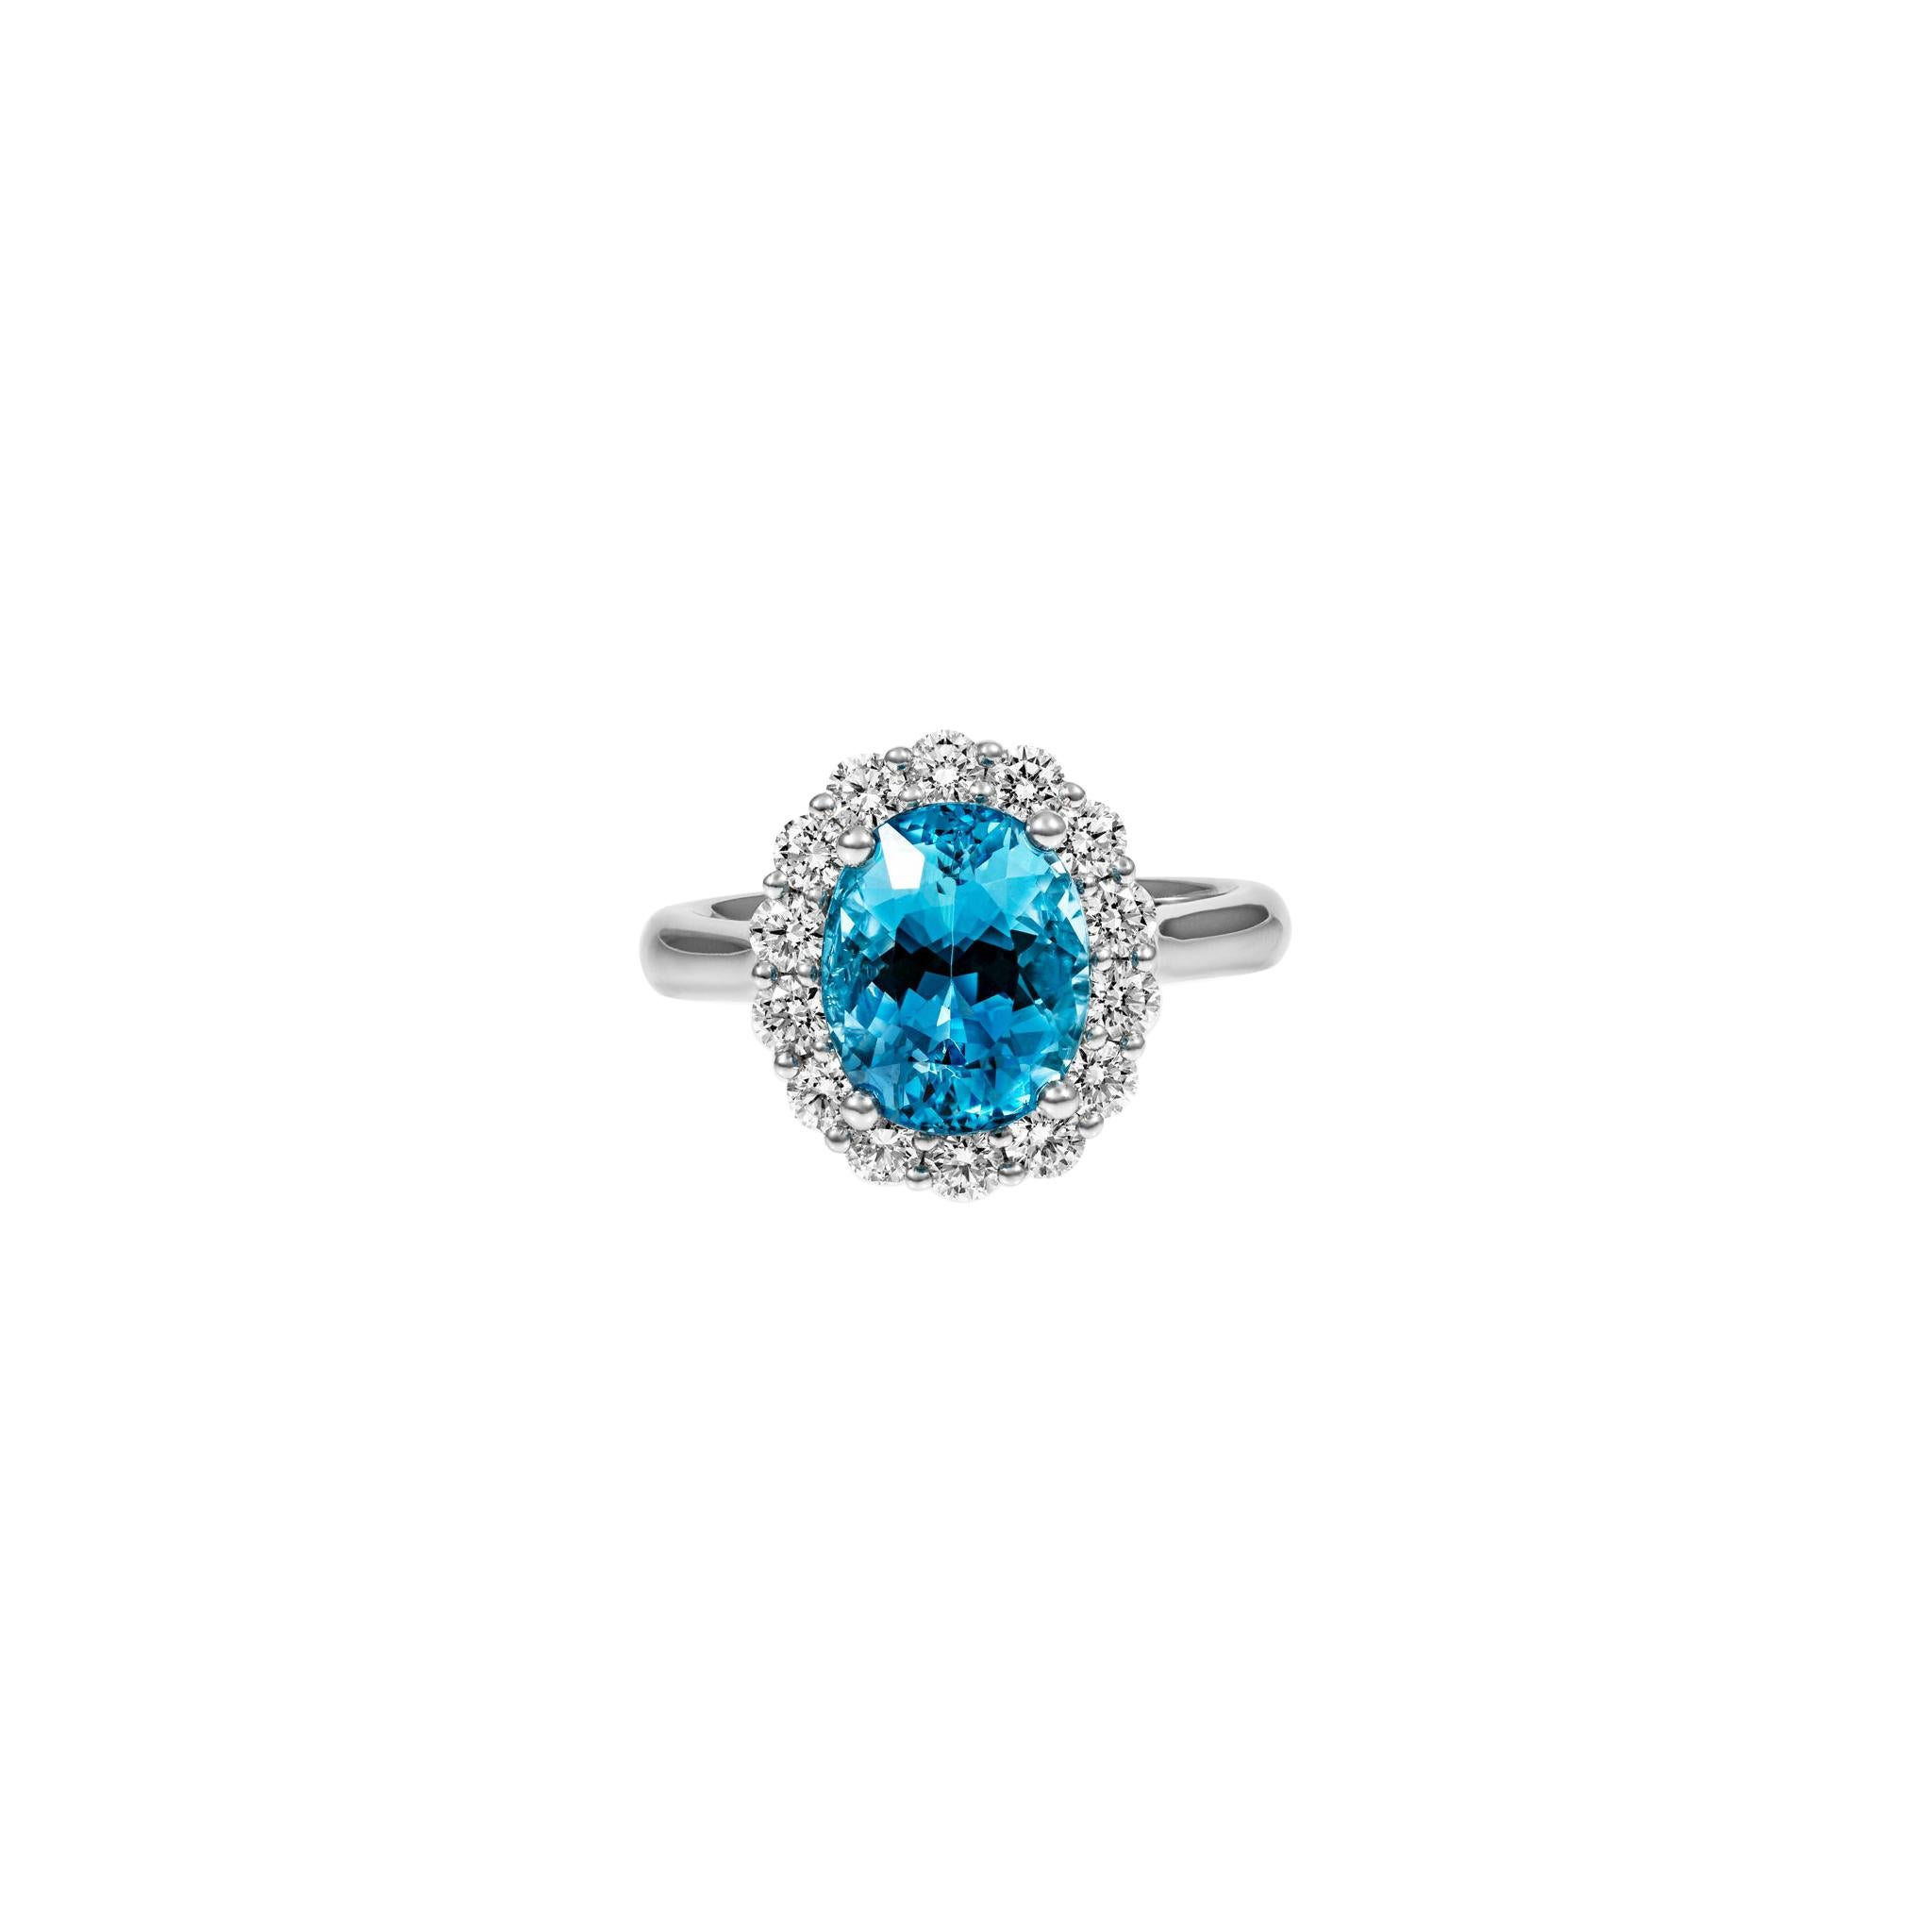 2.3ct Oval Aquamarine .84ct Diamond 18kt White Gold Ring